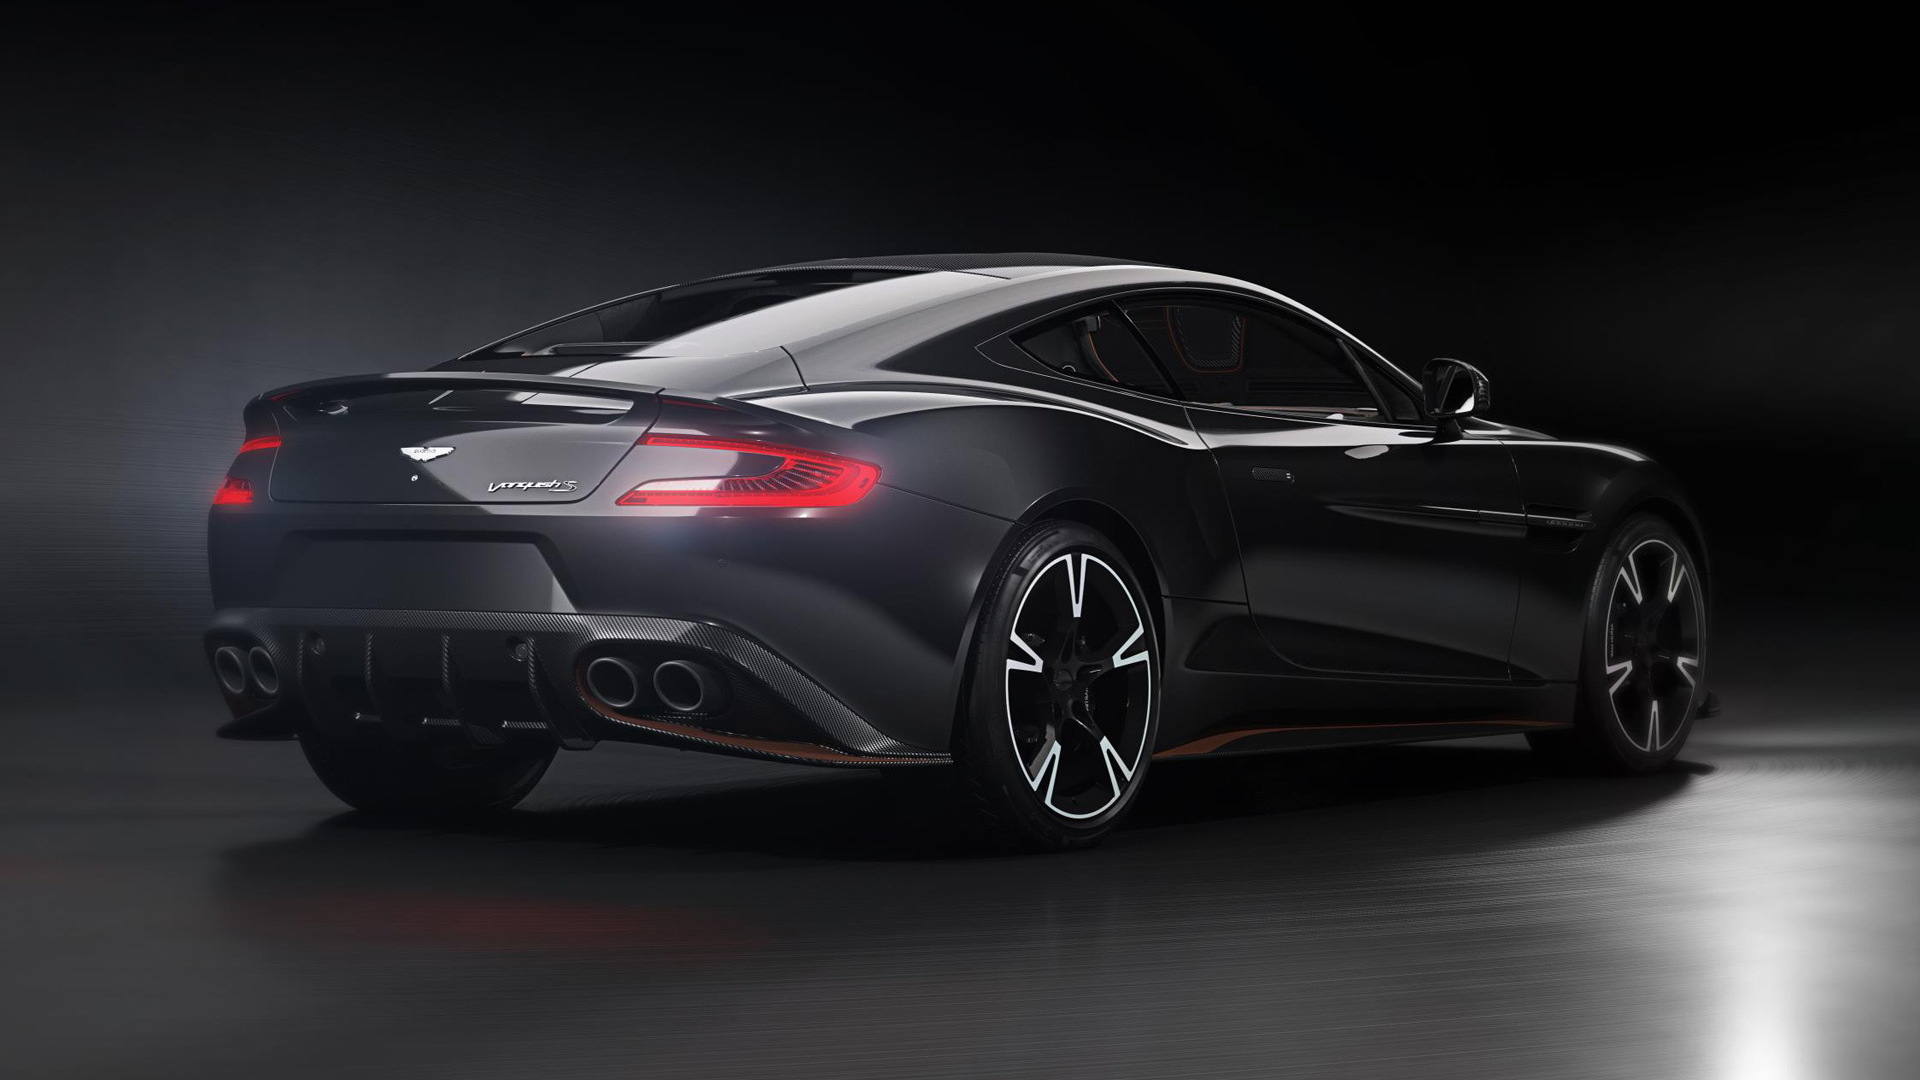 2018 Aston Martin Vanquish S Ultimate